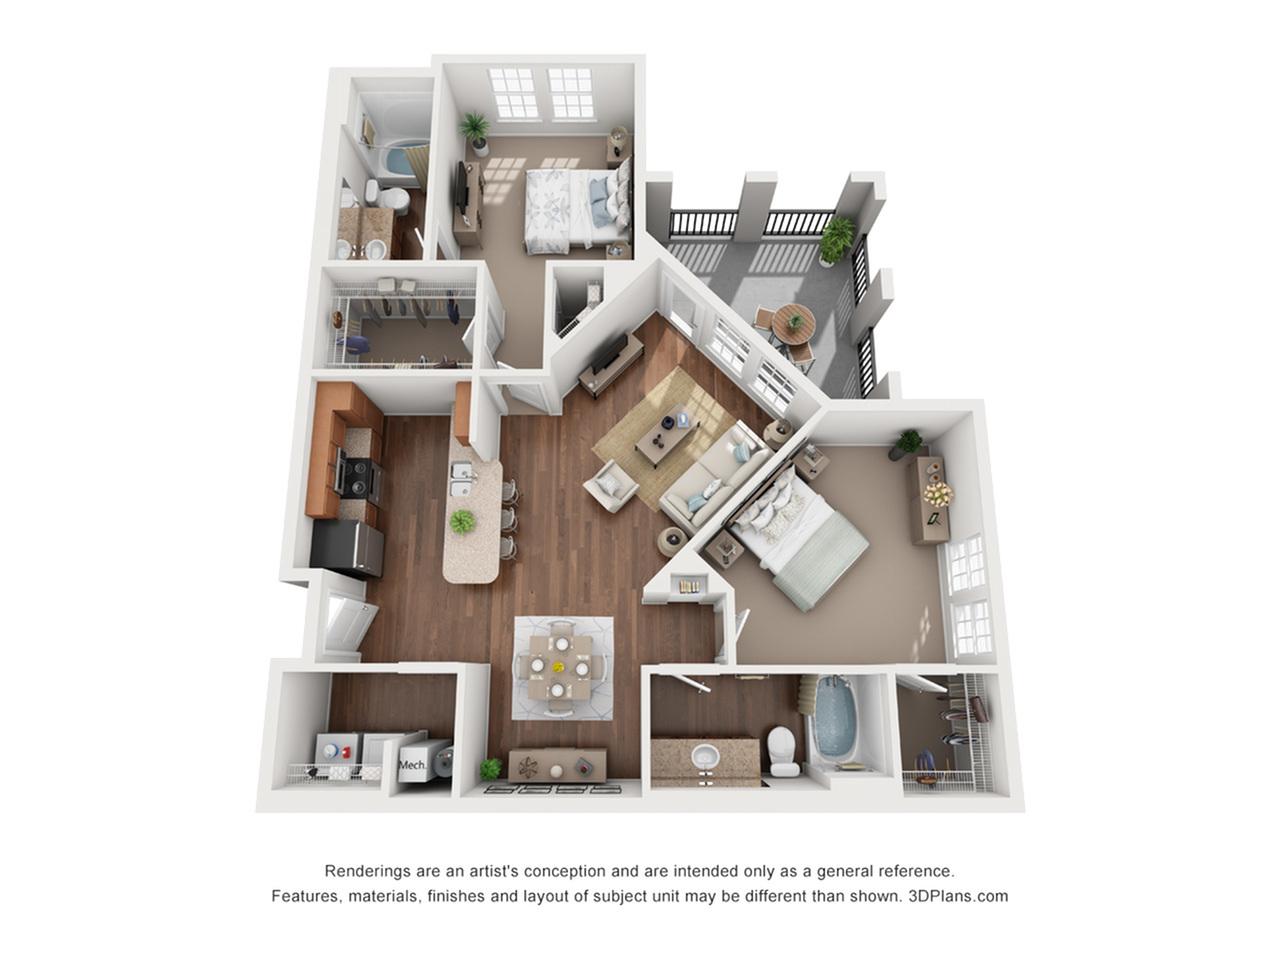 2 Bedrooms Floorplan 3 | The Vineyards at Hammock Ridge